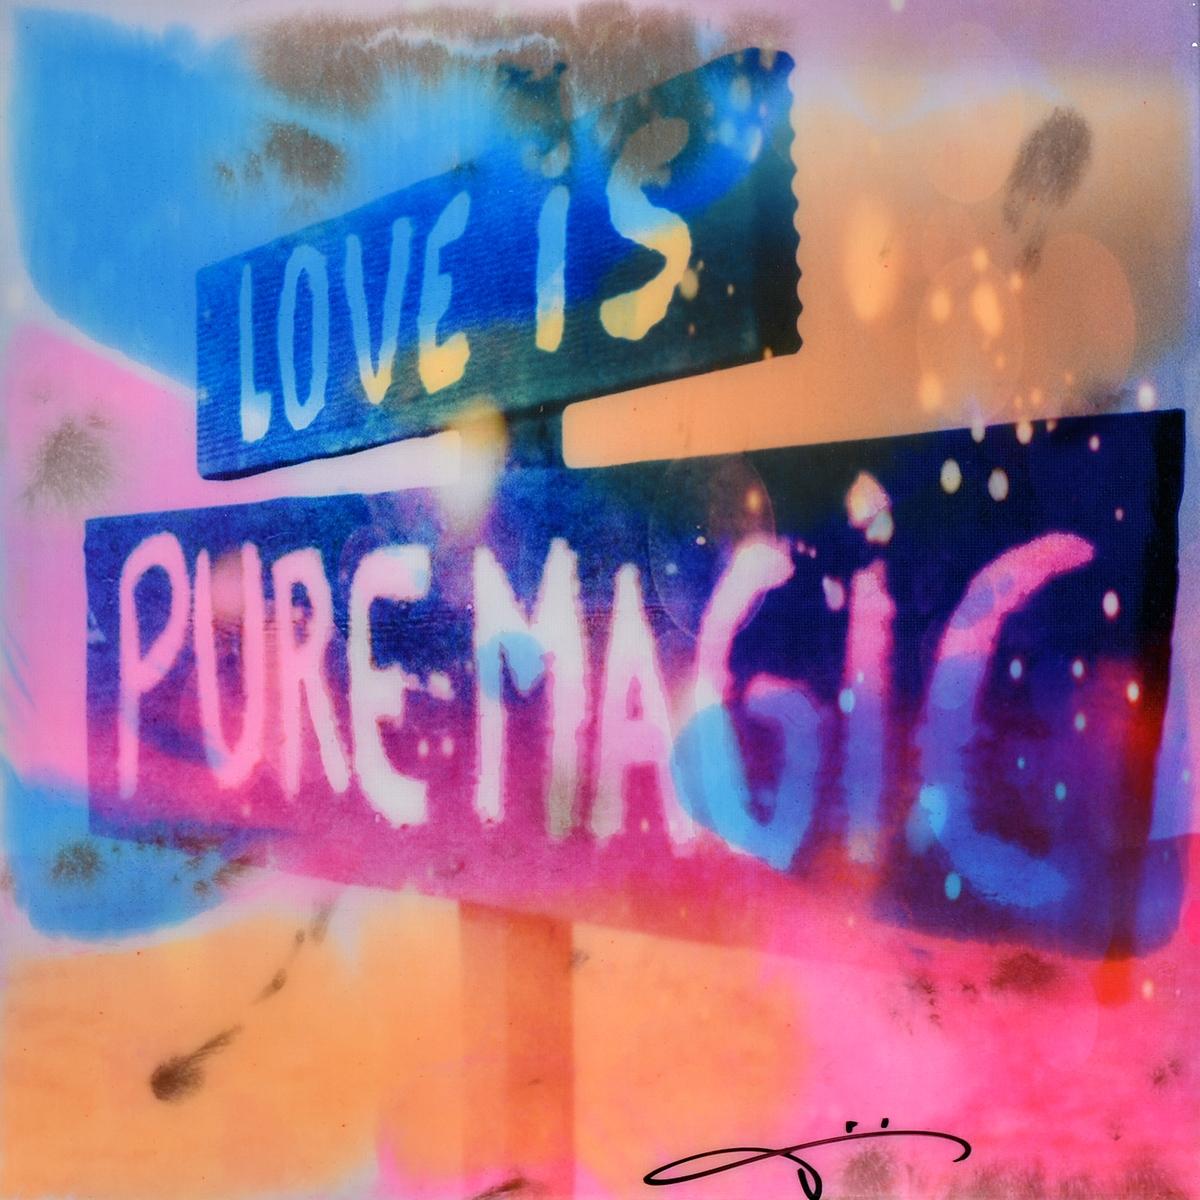 Pure Magic - Epoxy - 2019